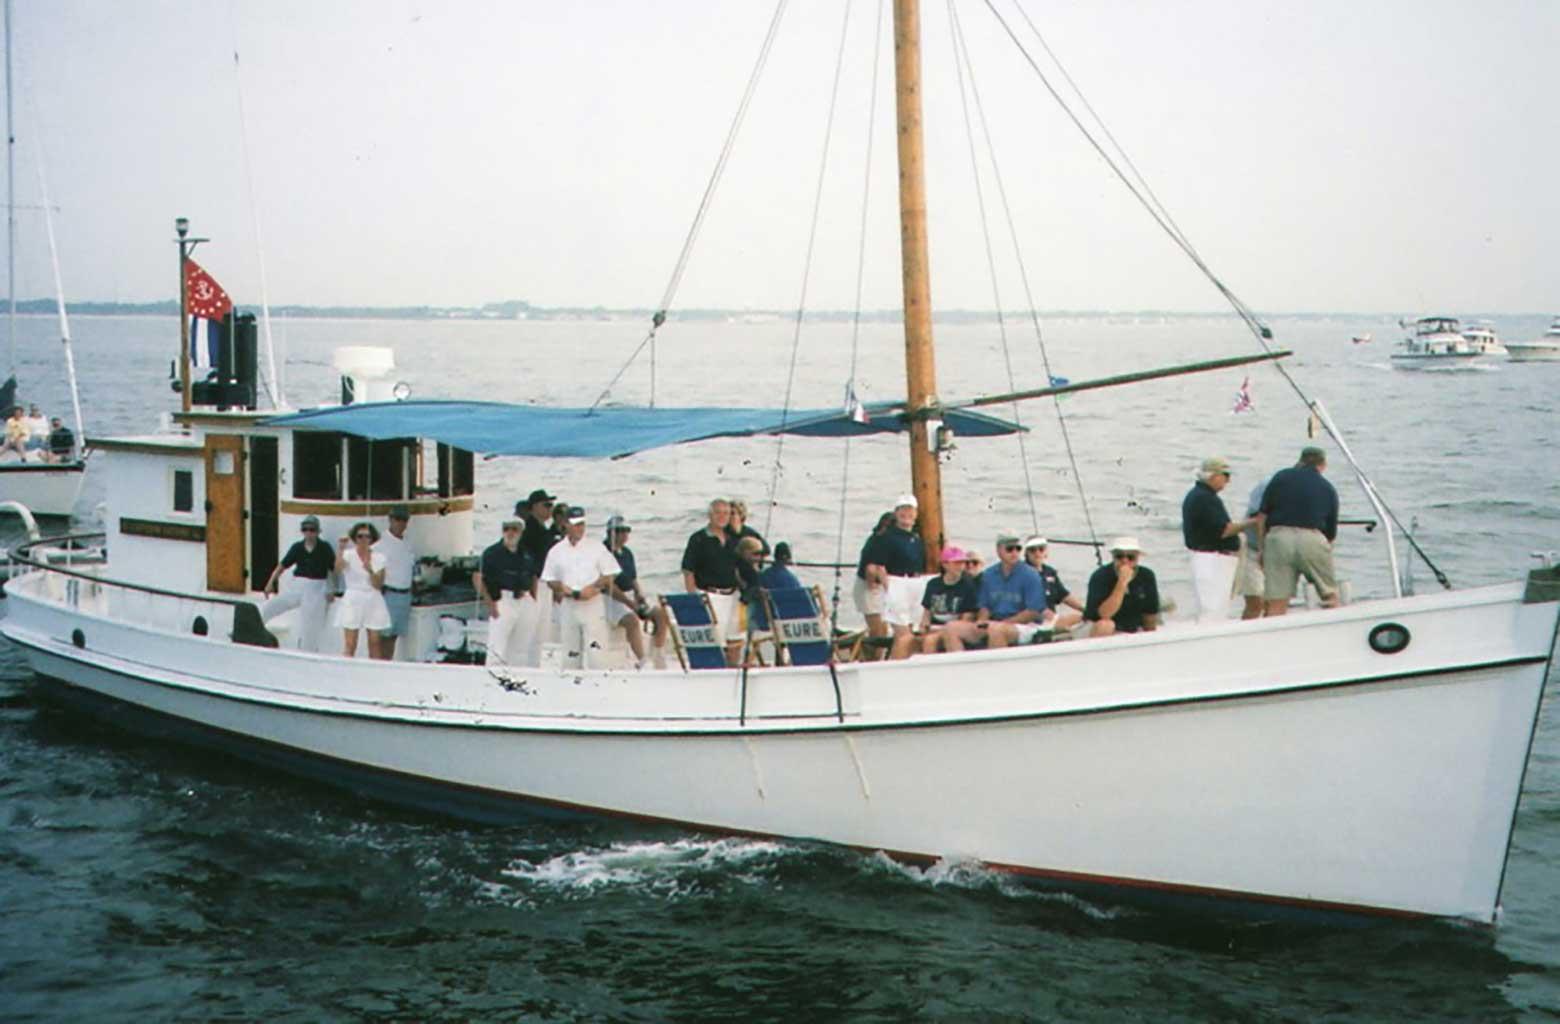 capt-latane-off-thimble-shoals-top-sail-2000-parade-img274